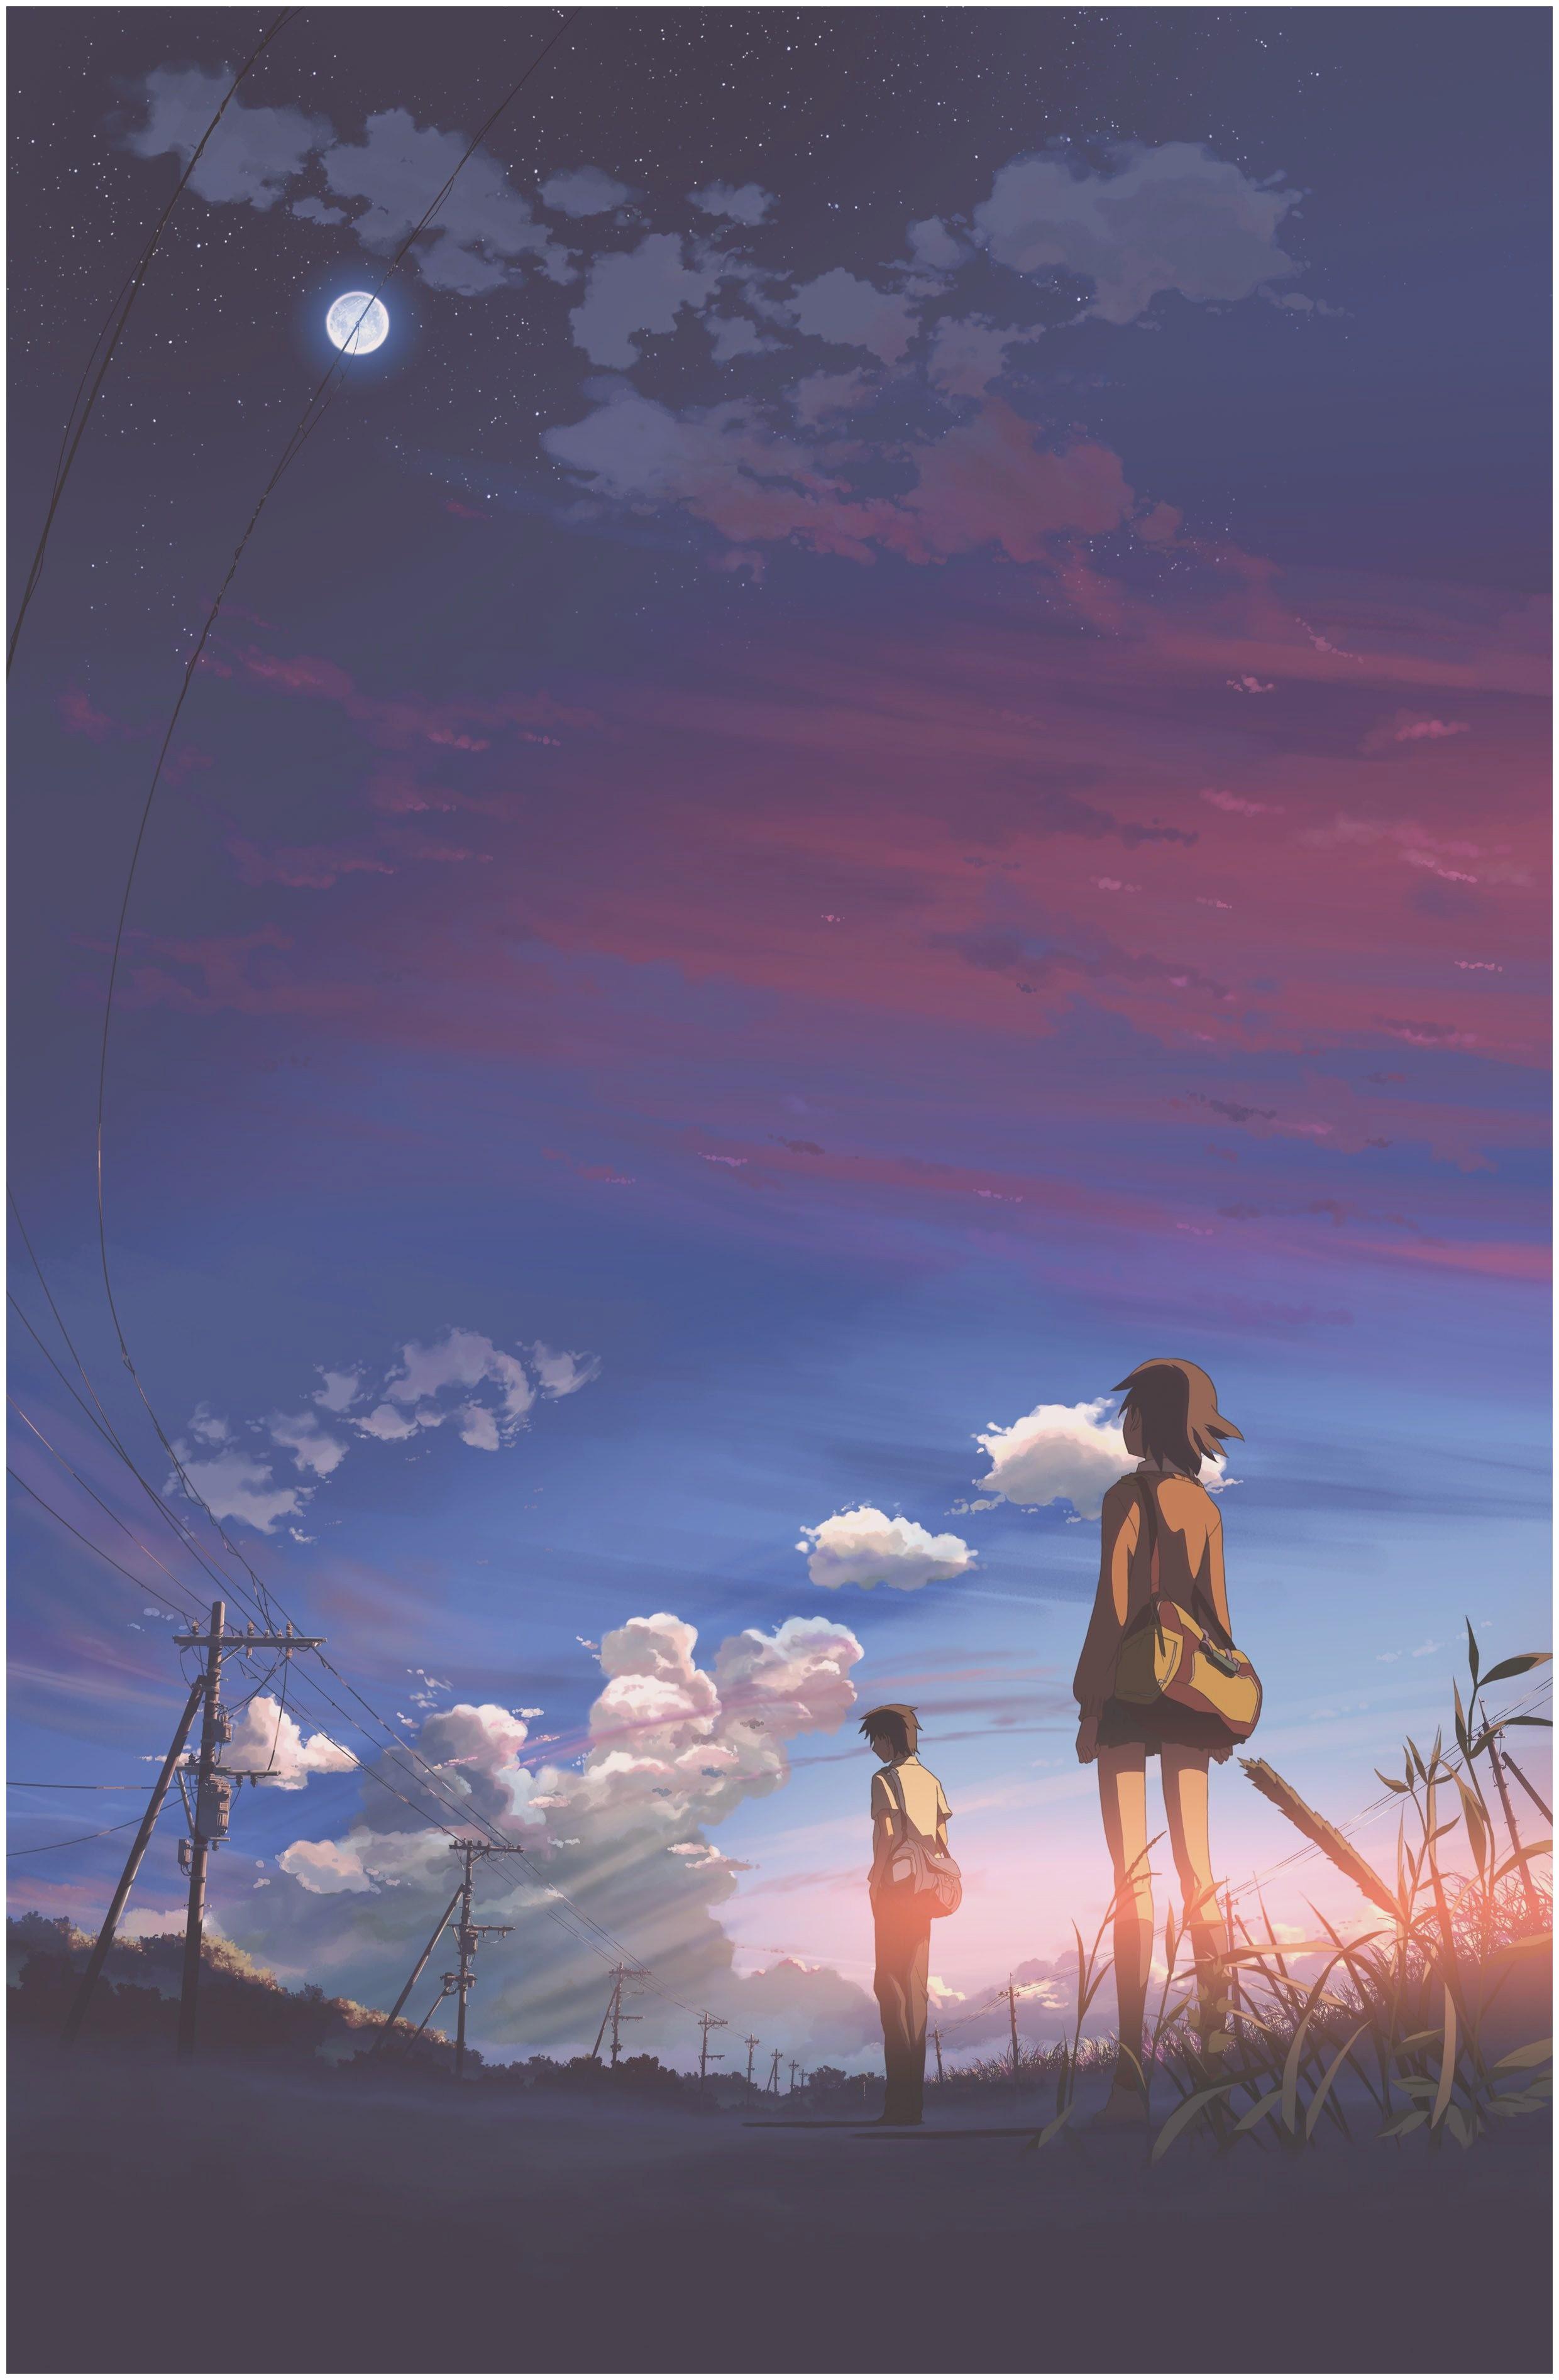 Anime Wallpaper Hd Anime Scenery Wallpaper For Phone